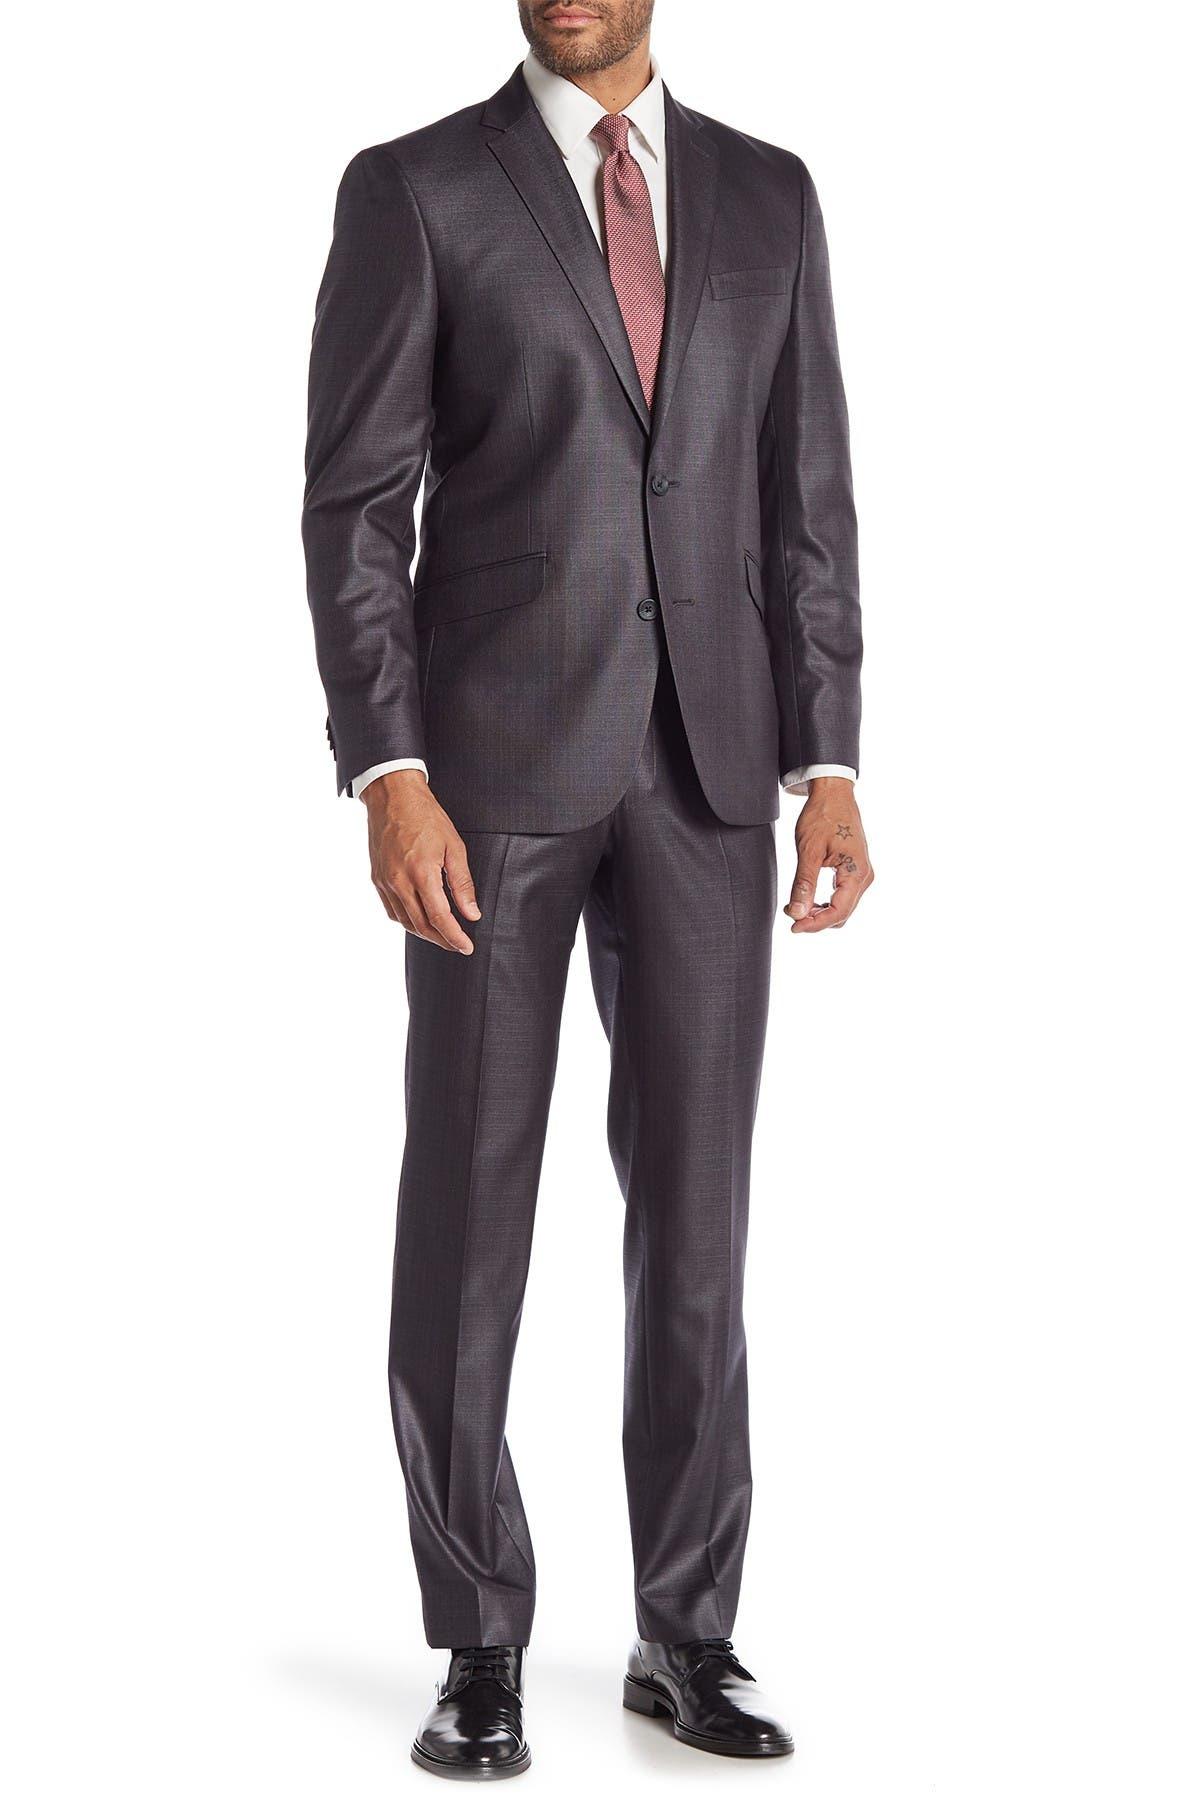 Image of Kenneth Cole Reaction Techni-Cole Basketweave Notch Lapel Performance Stretch Slim Fit Suit